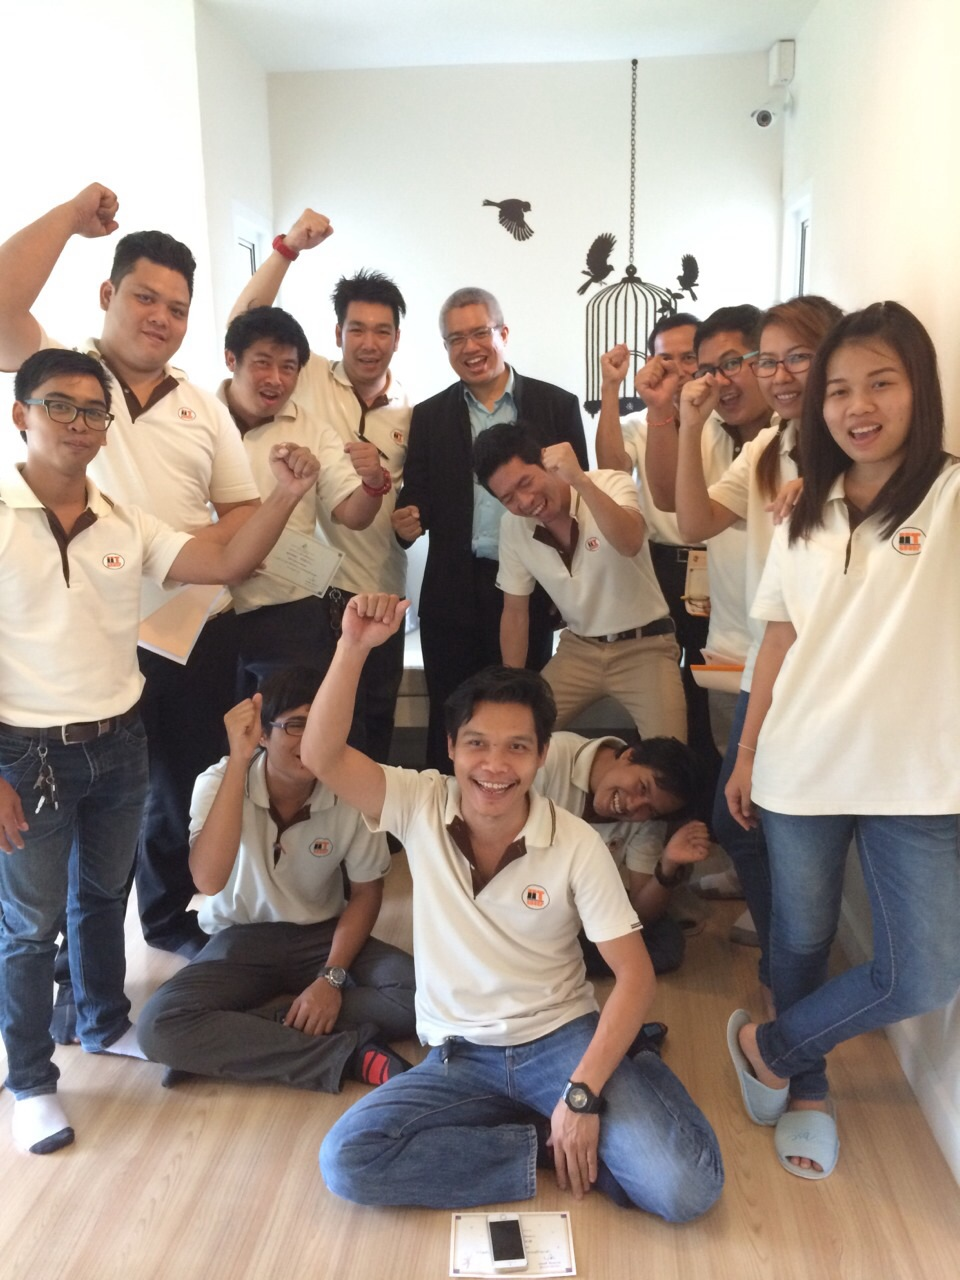 In house Training IIT GROUP การส้างขวัญกำลังใจ ในภาวะเศรษฐกิจตกต่ำ 26-7-57